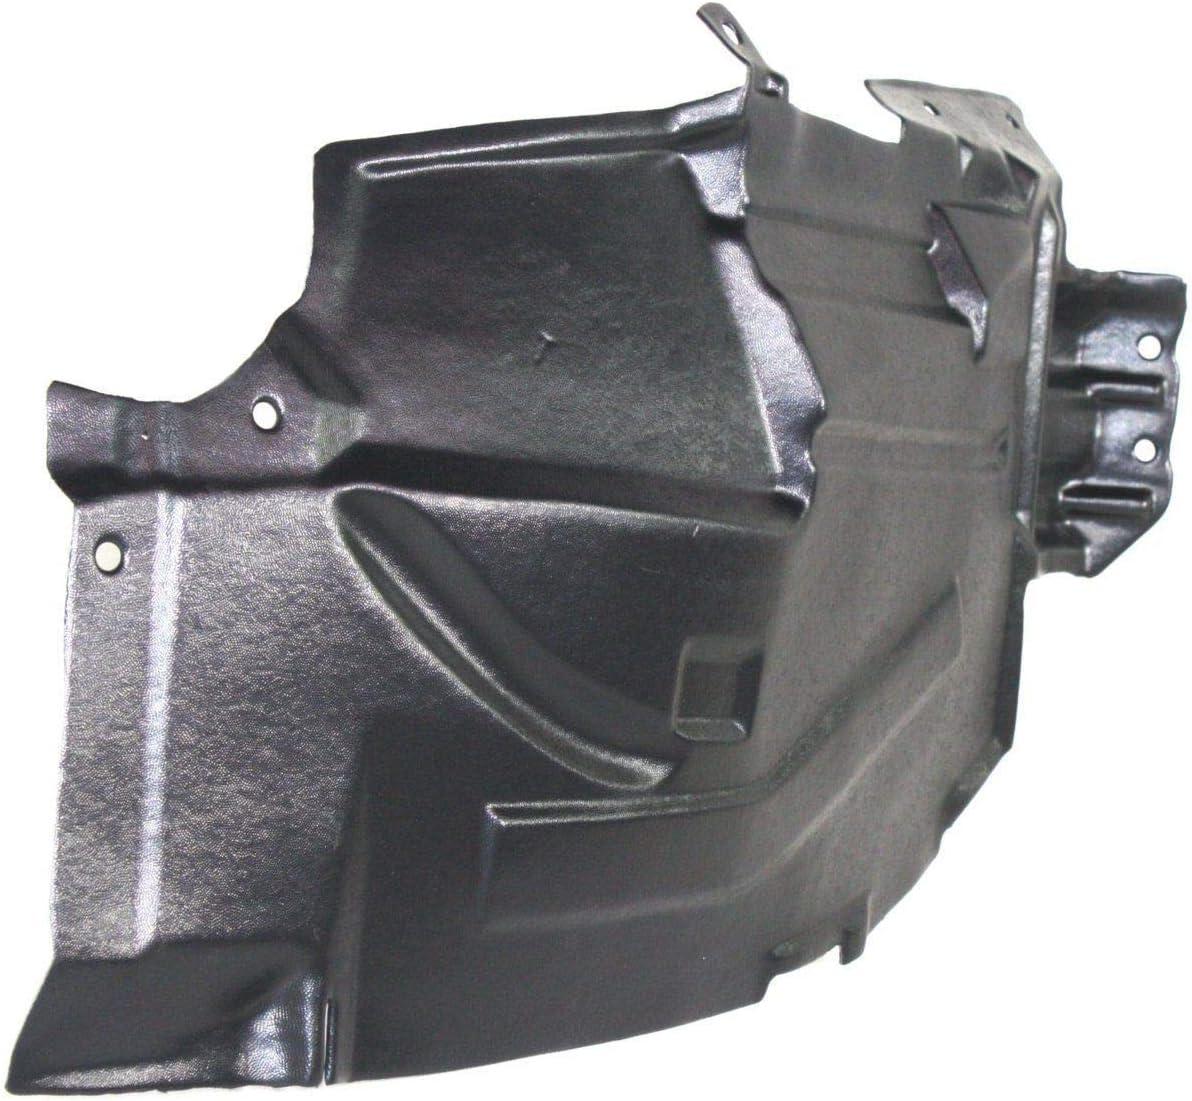 NI1249108 63844CA00A Parts N Go 2003-2007 Murano Fender Liner Passenger Side Right Hand Splash Guard